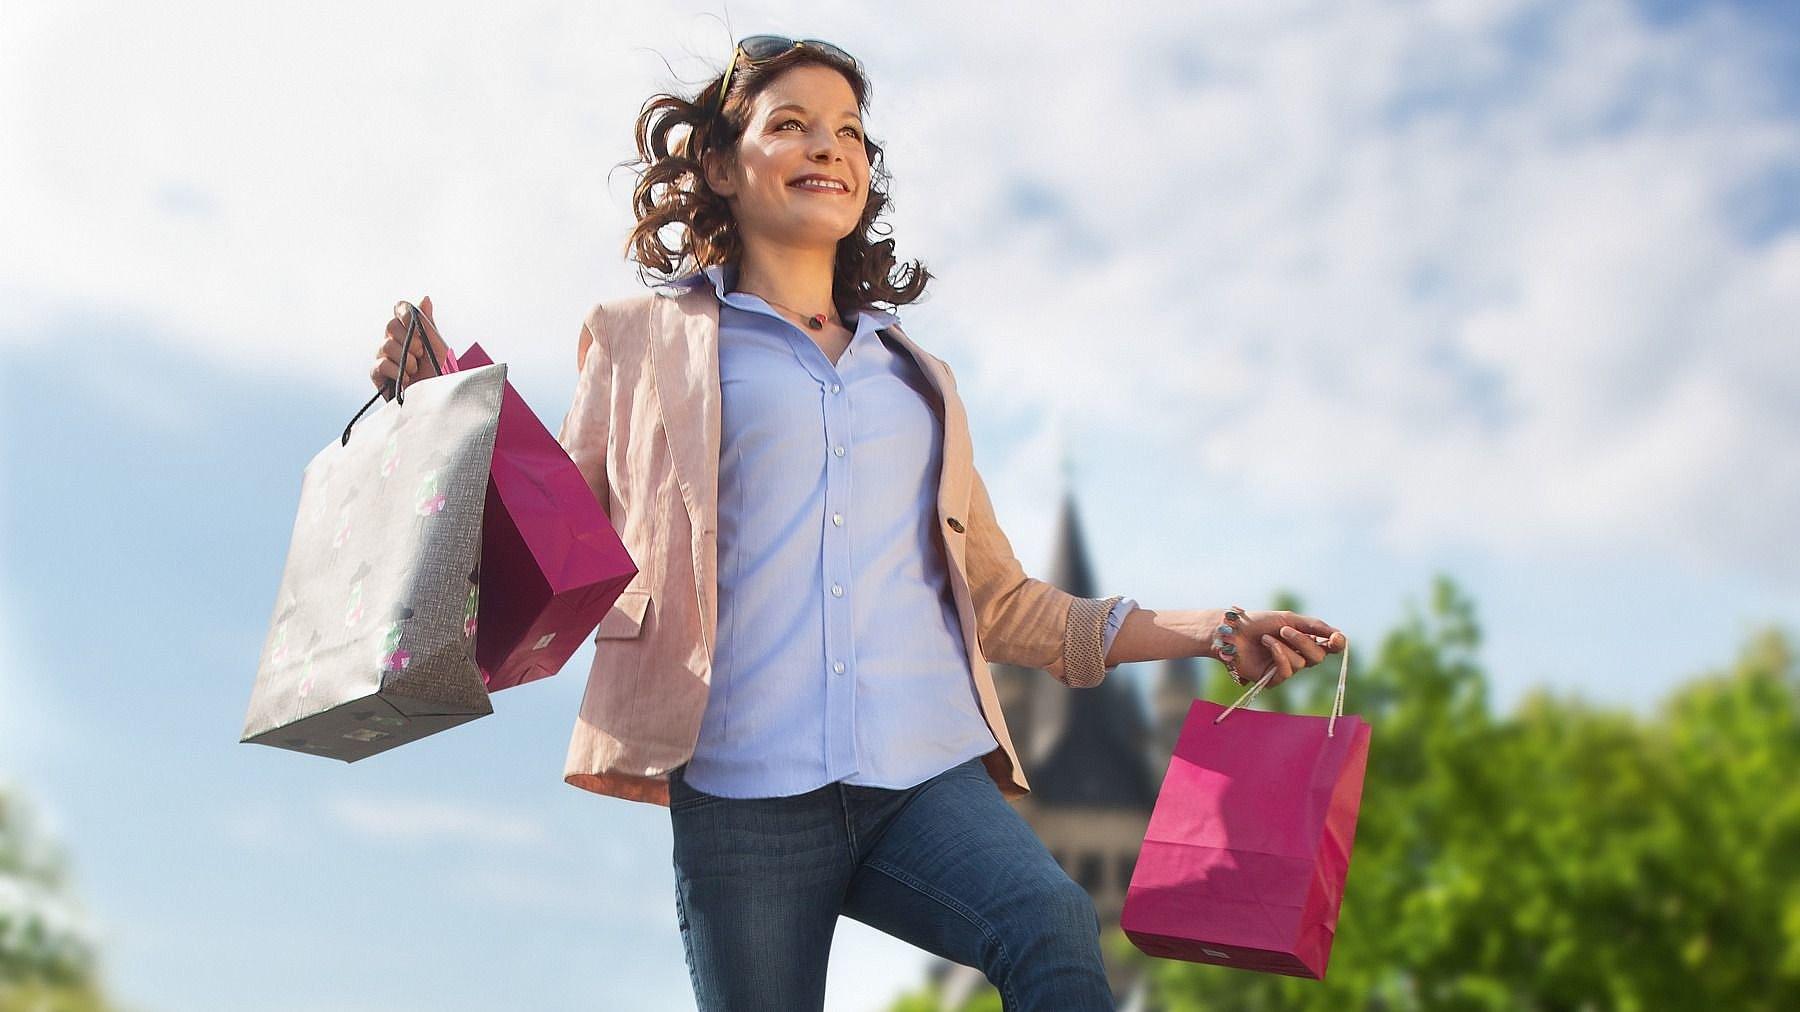 igli Comfort carbon insoles woman shopping bags medi